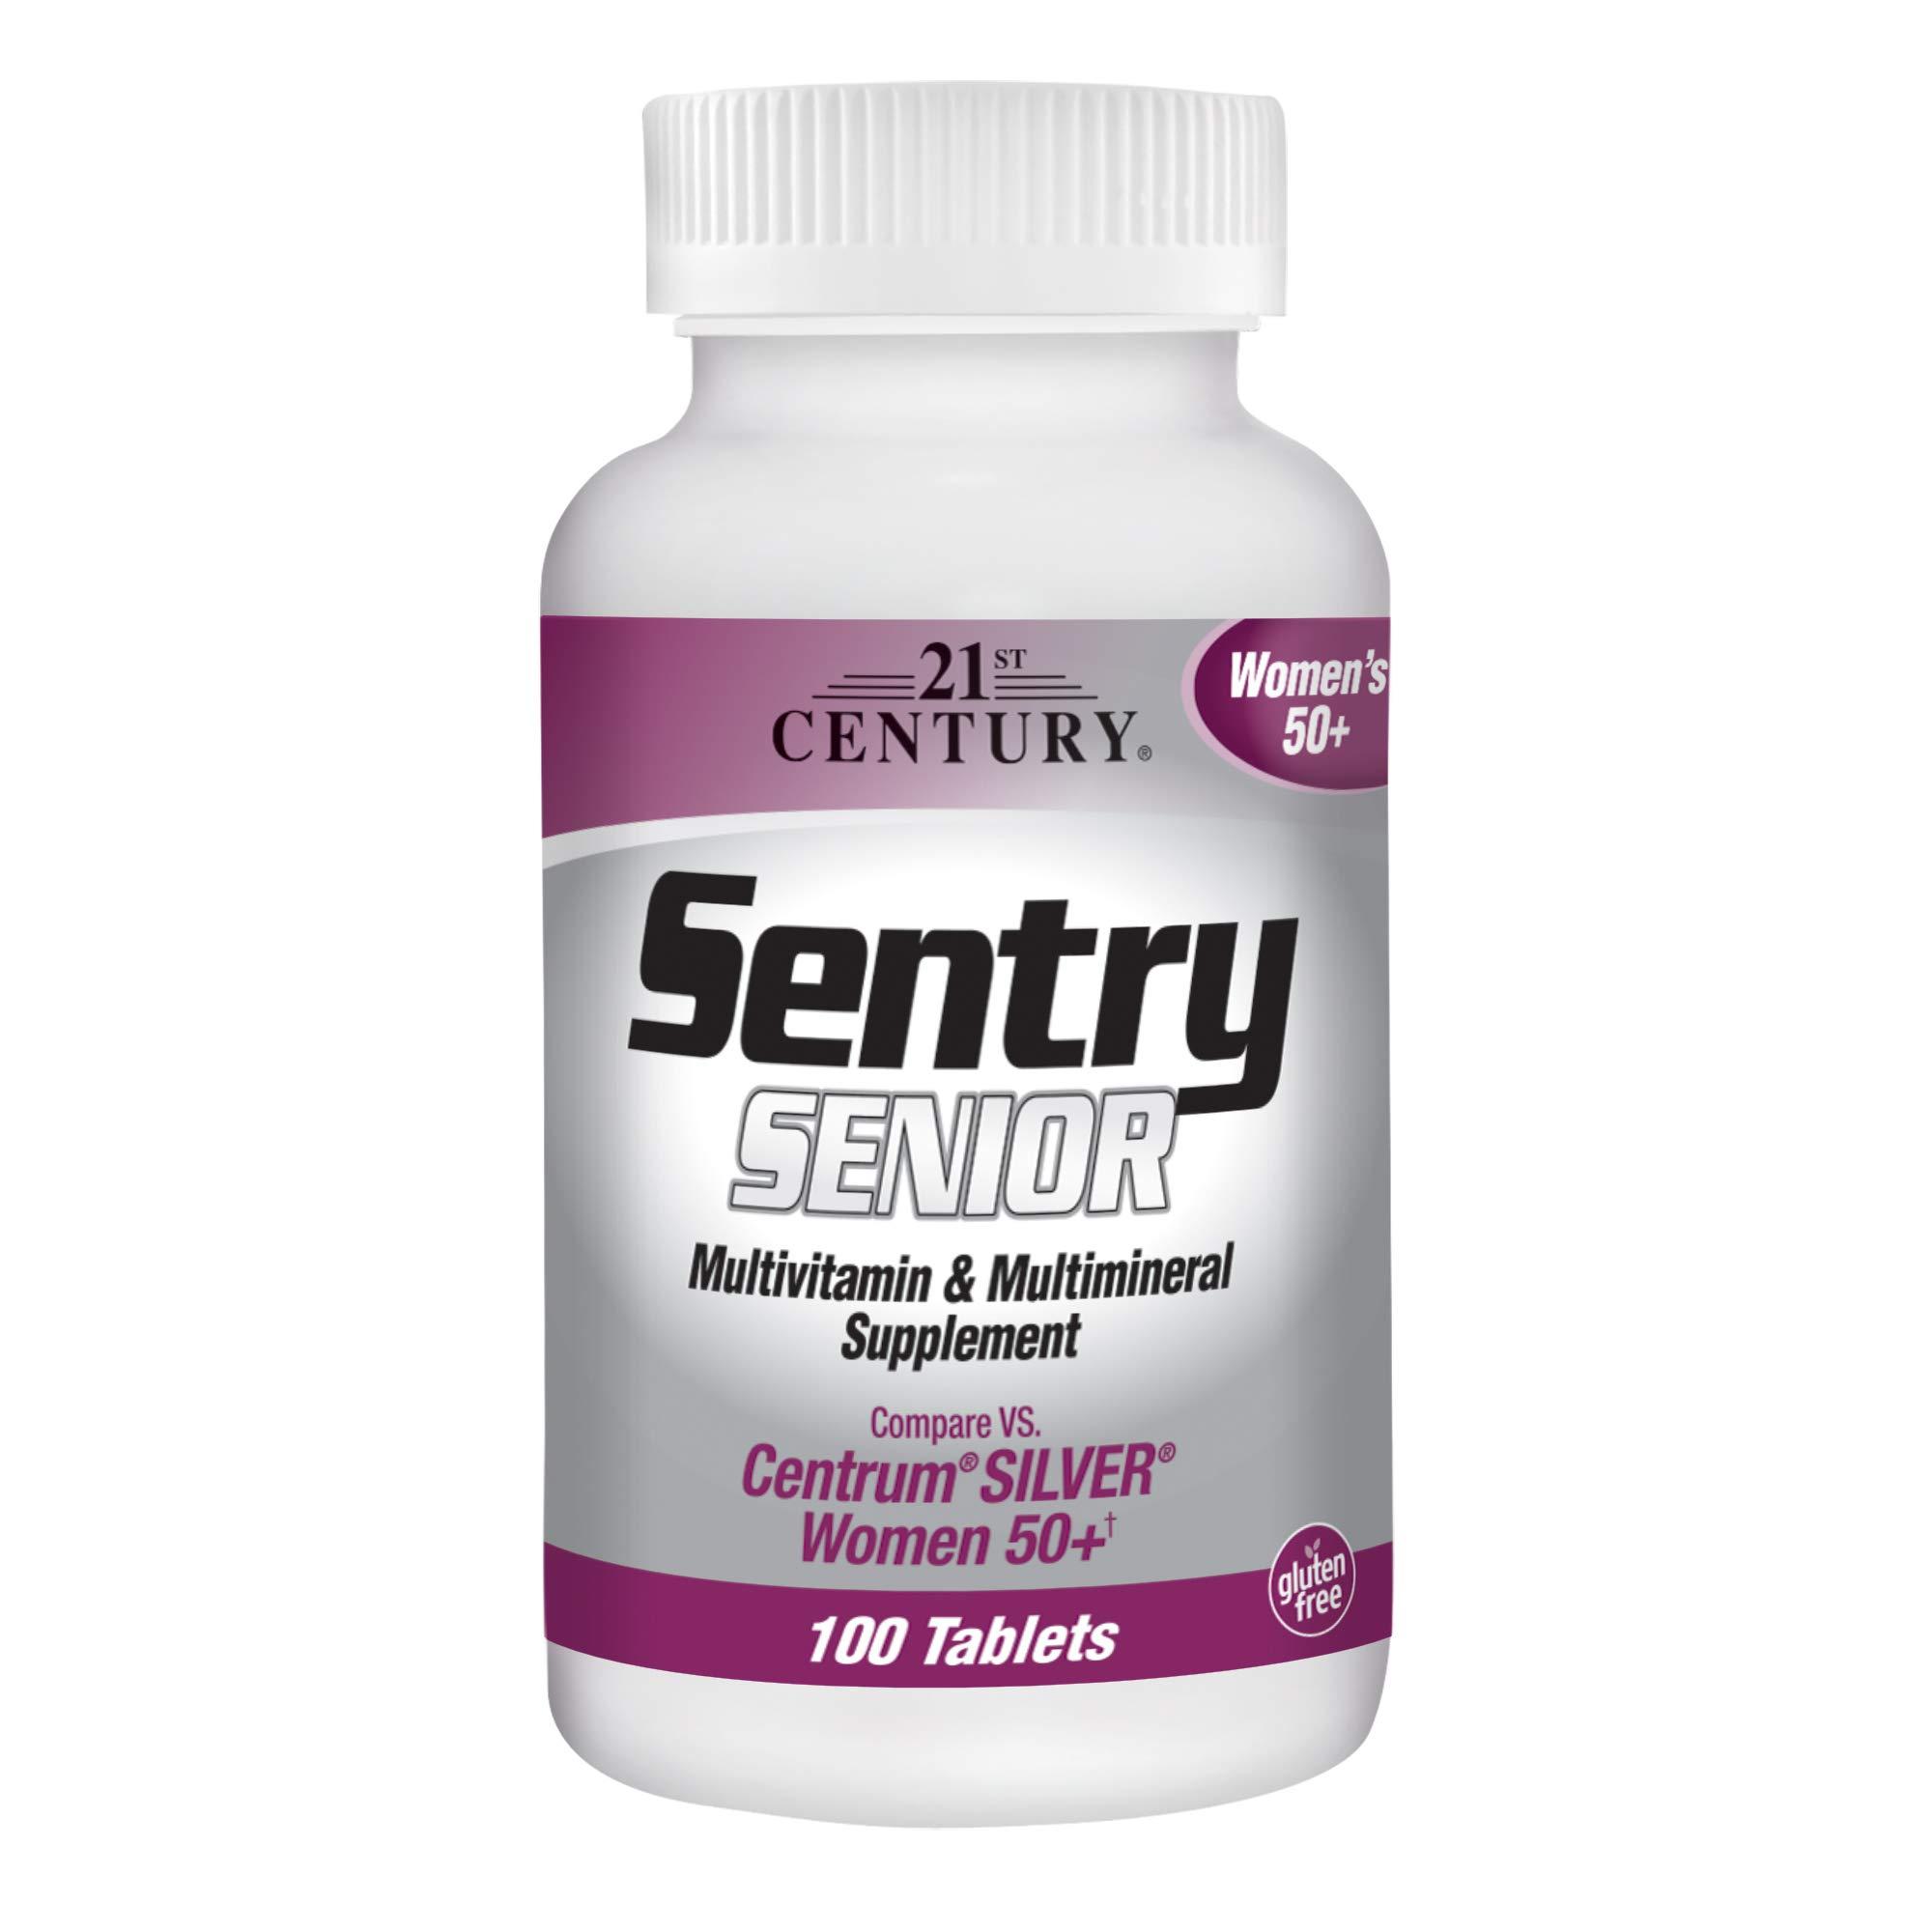 21st Century Sentry Senior Women 50 Plus Tablets, 100 Count (27542)